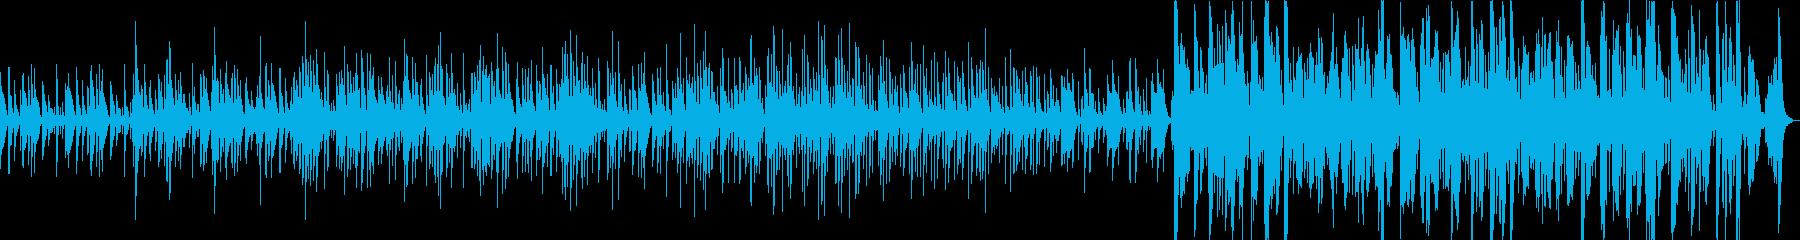 KANTエスニックリズム200603の再生済みの波形